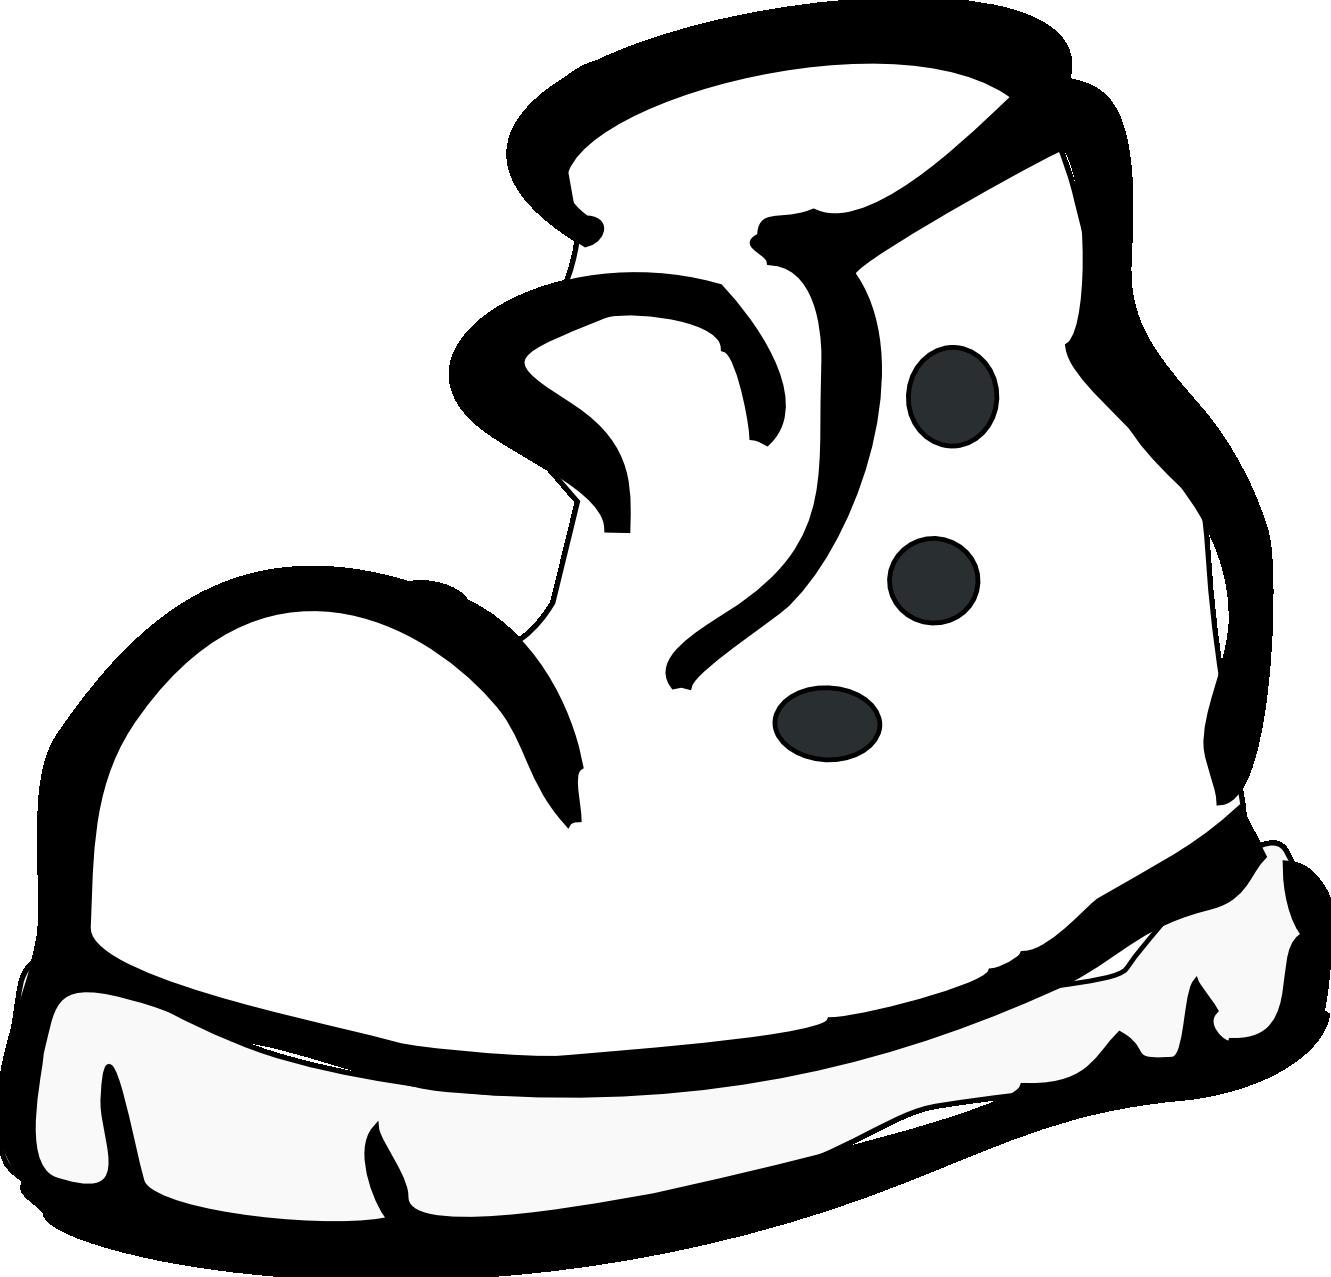 Shoes clipart images clipart image #14976